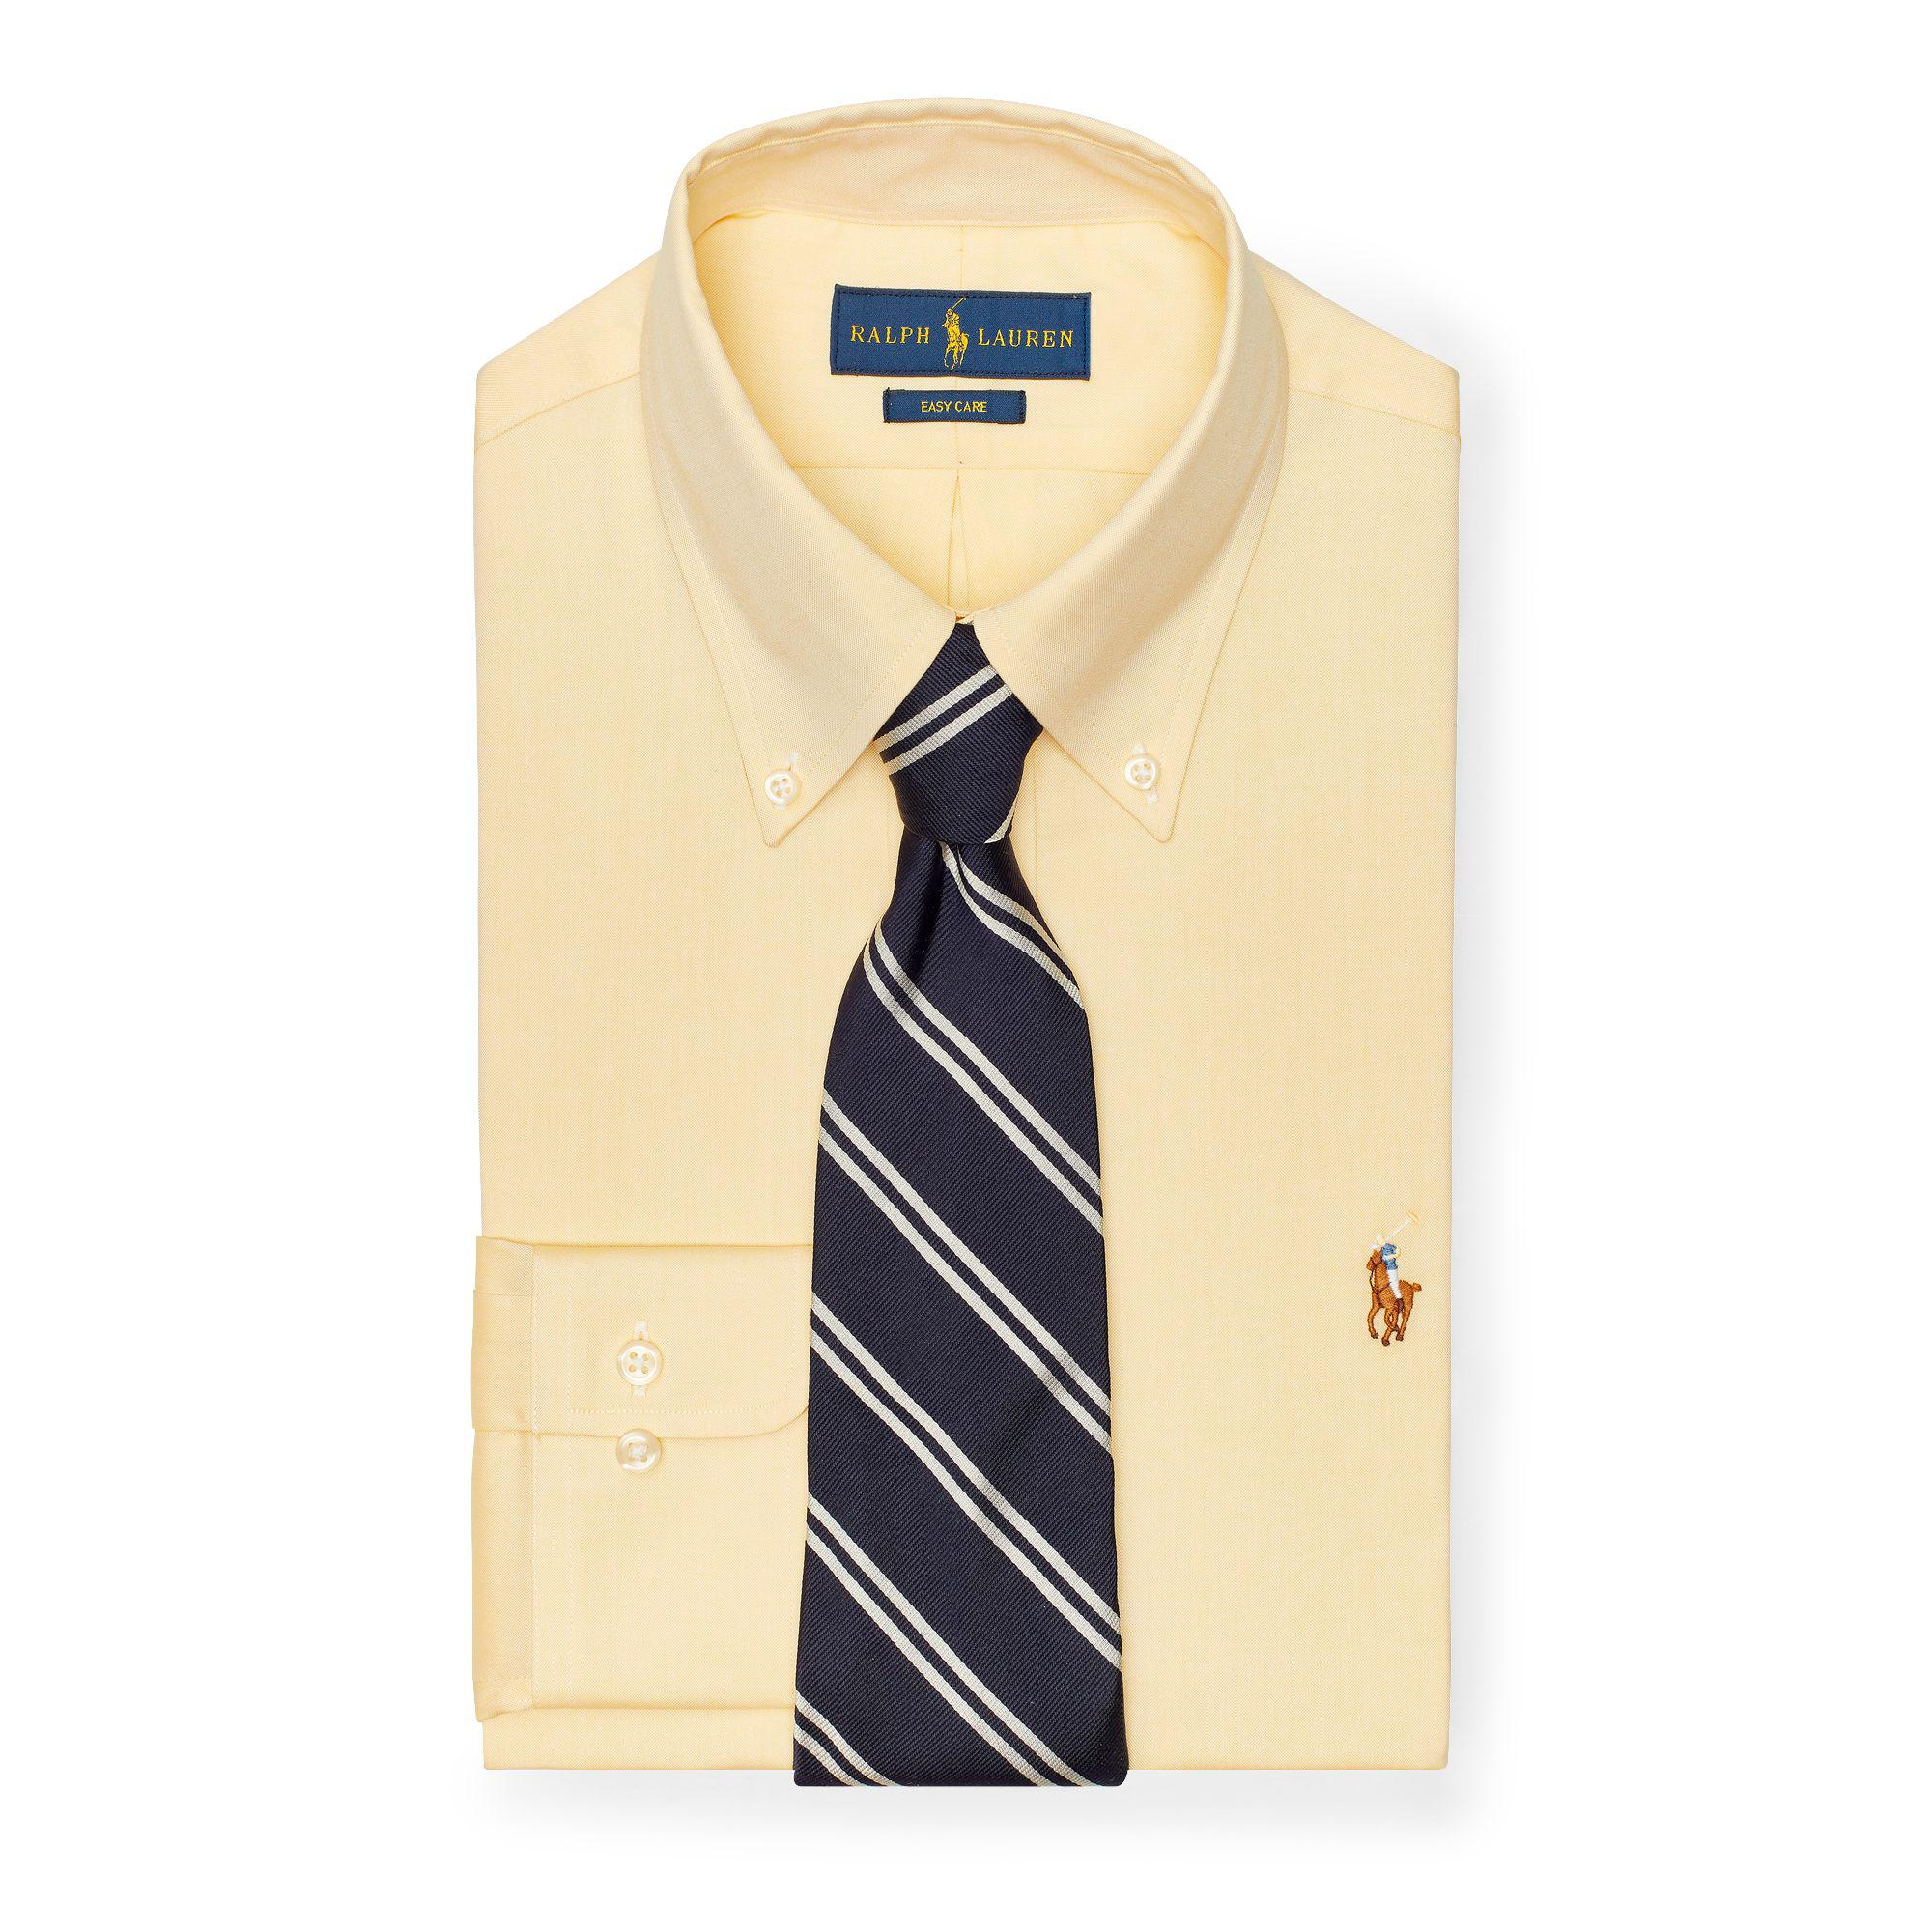 30f4e0ff1d0 Polo Ralph Lauren Custom Fit Oxford Shirt in Yellow for Men - Lyst